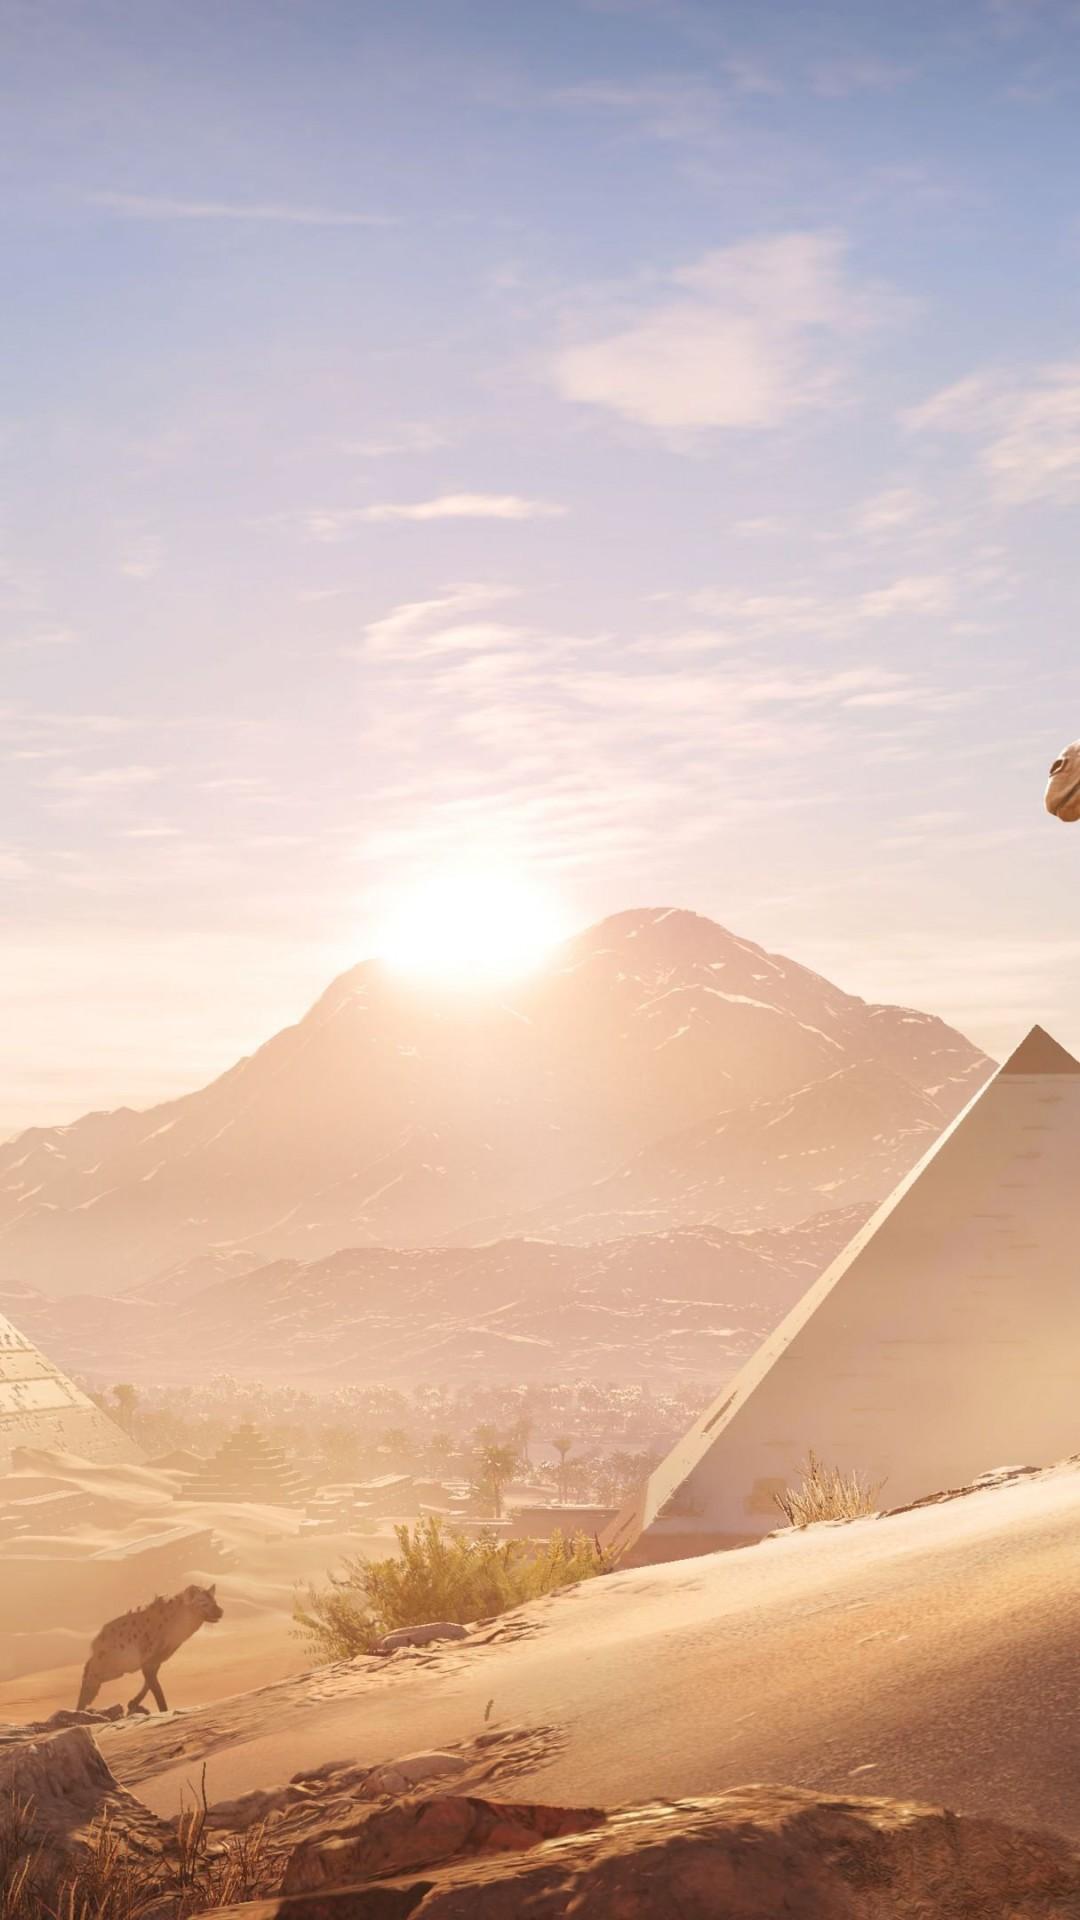 Assassins Creed Origins Egypt 4k Wallpaper - Assassin's Creed Origins Skull Icon , HD Wallpaper & Backgrounds